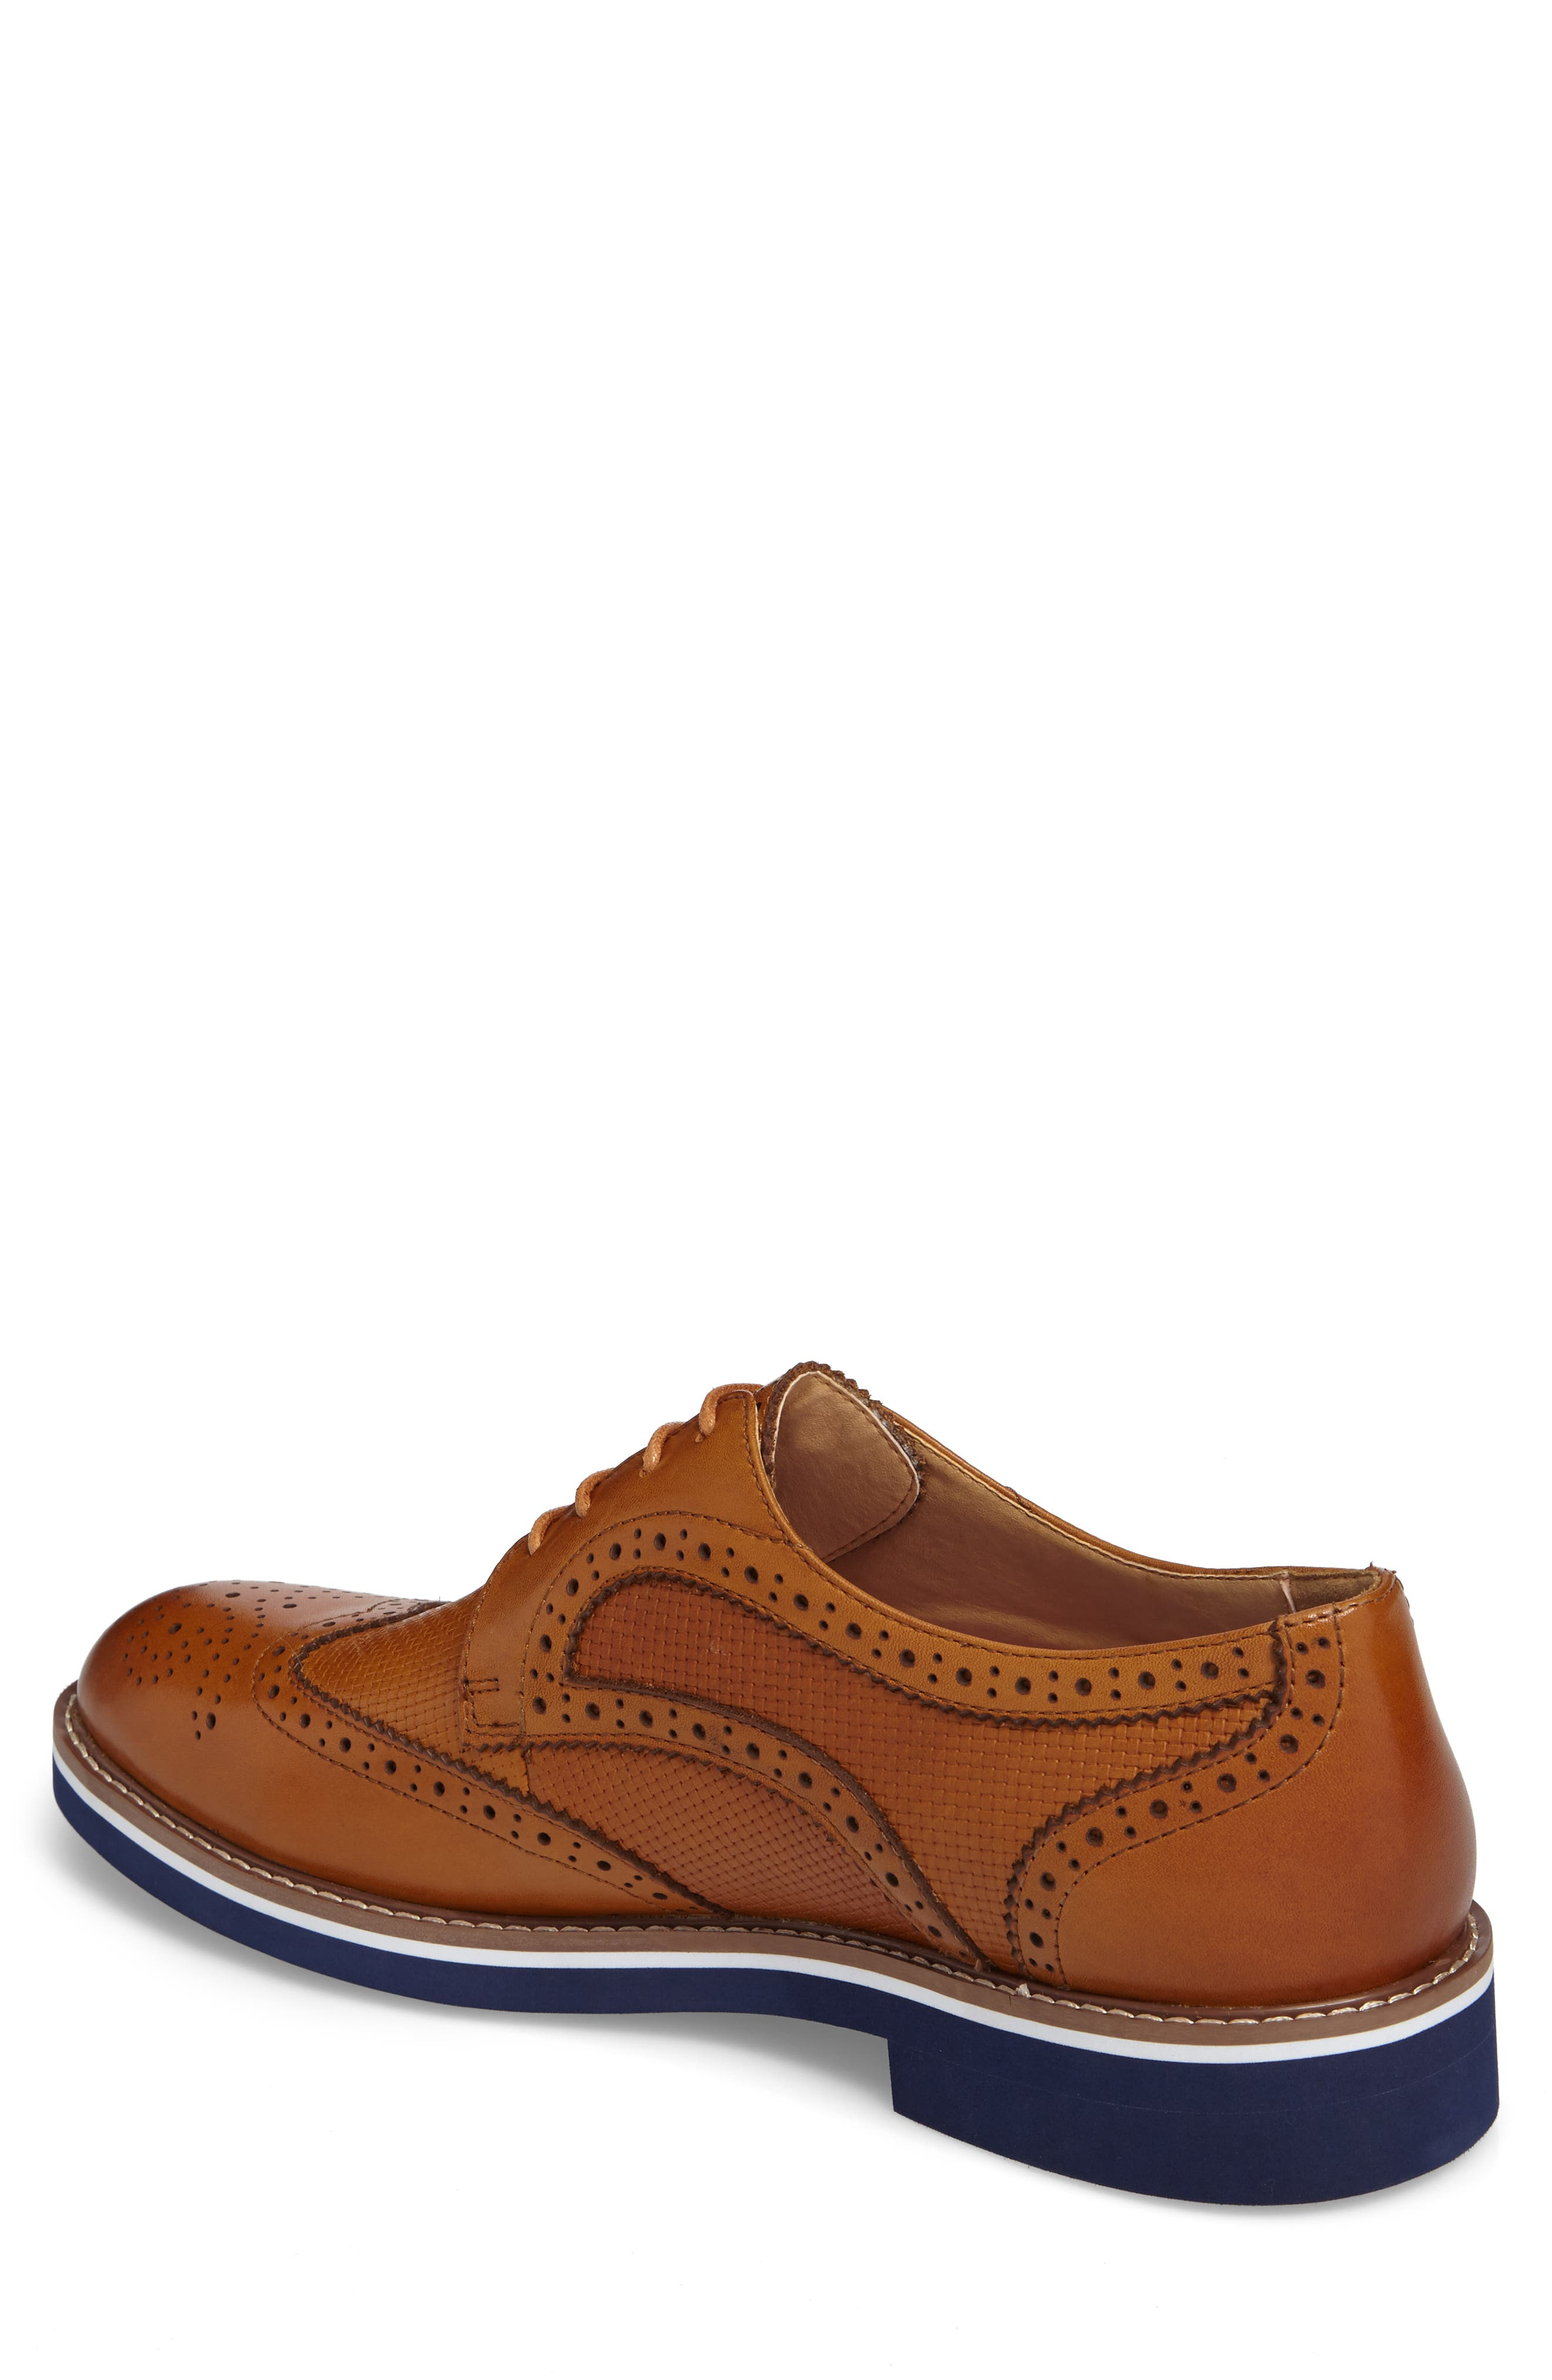 Northfields Spectator Shoe,                             Alternate thumbnail 4, color,